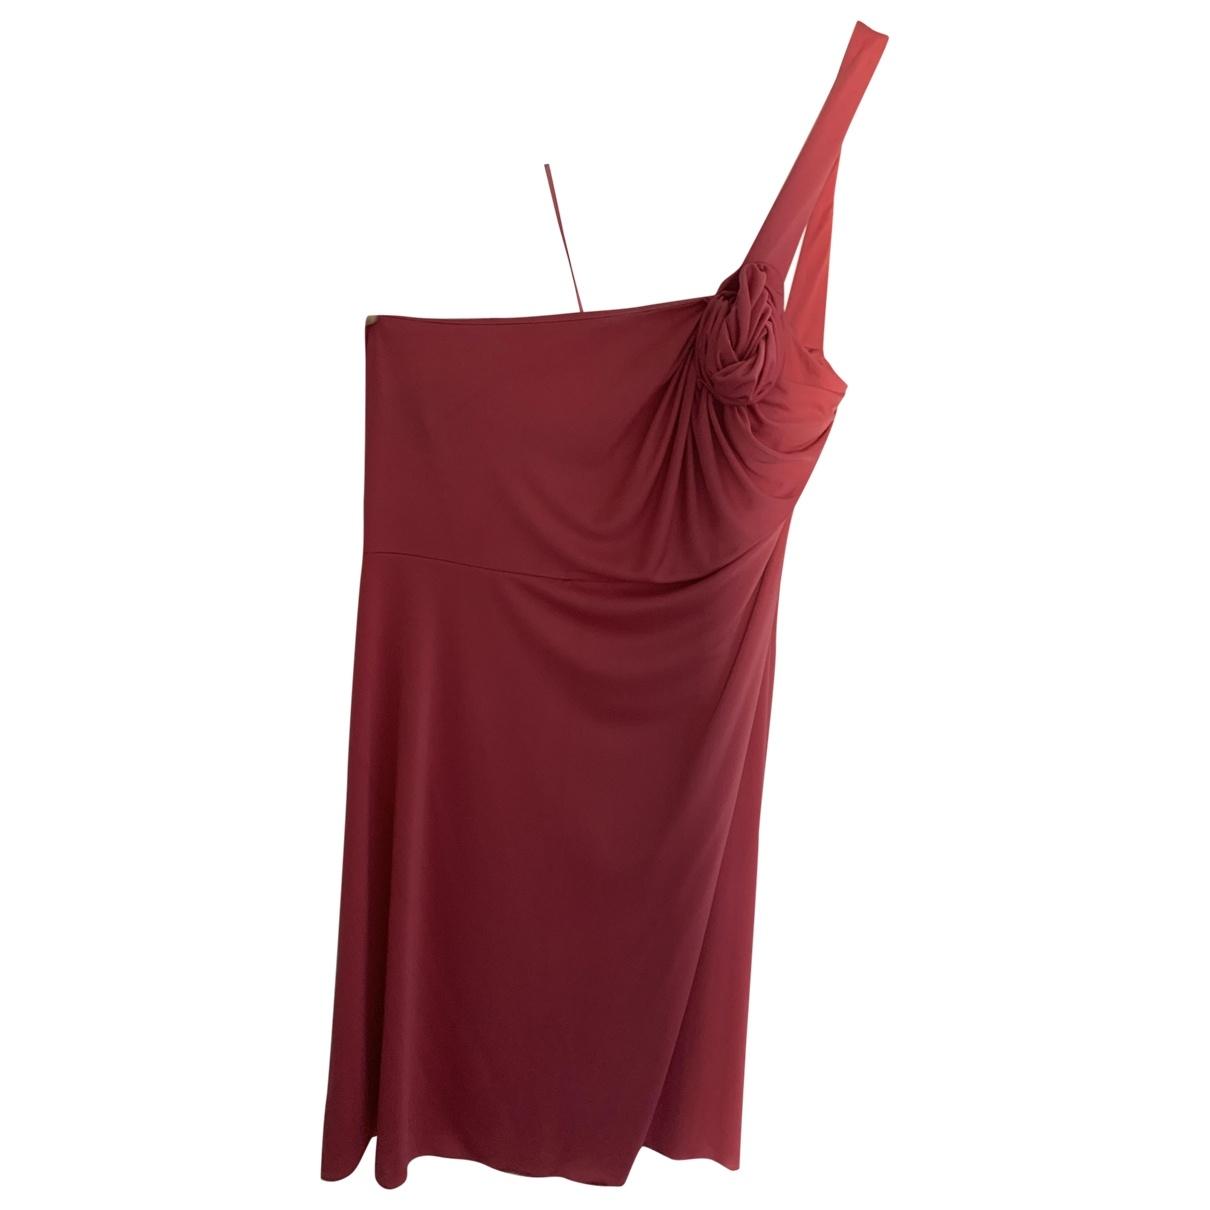 Yves Saint Laurent \N Kleid in  Rosa Polyester